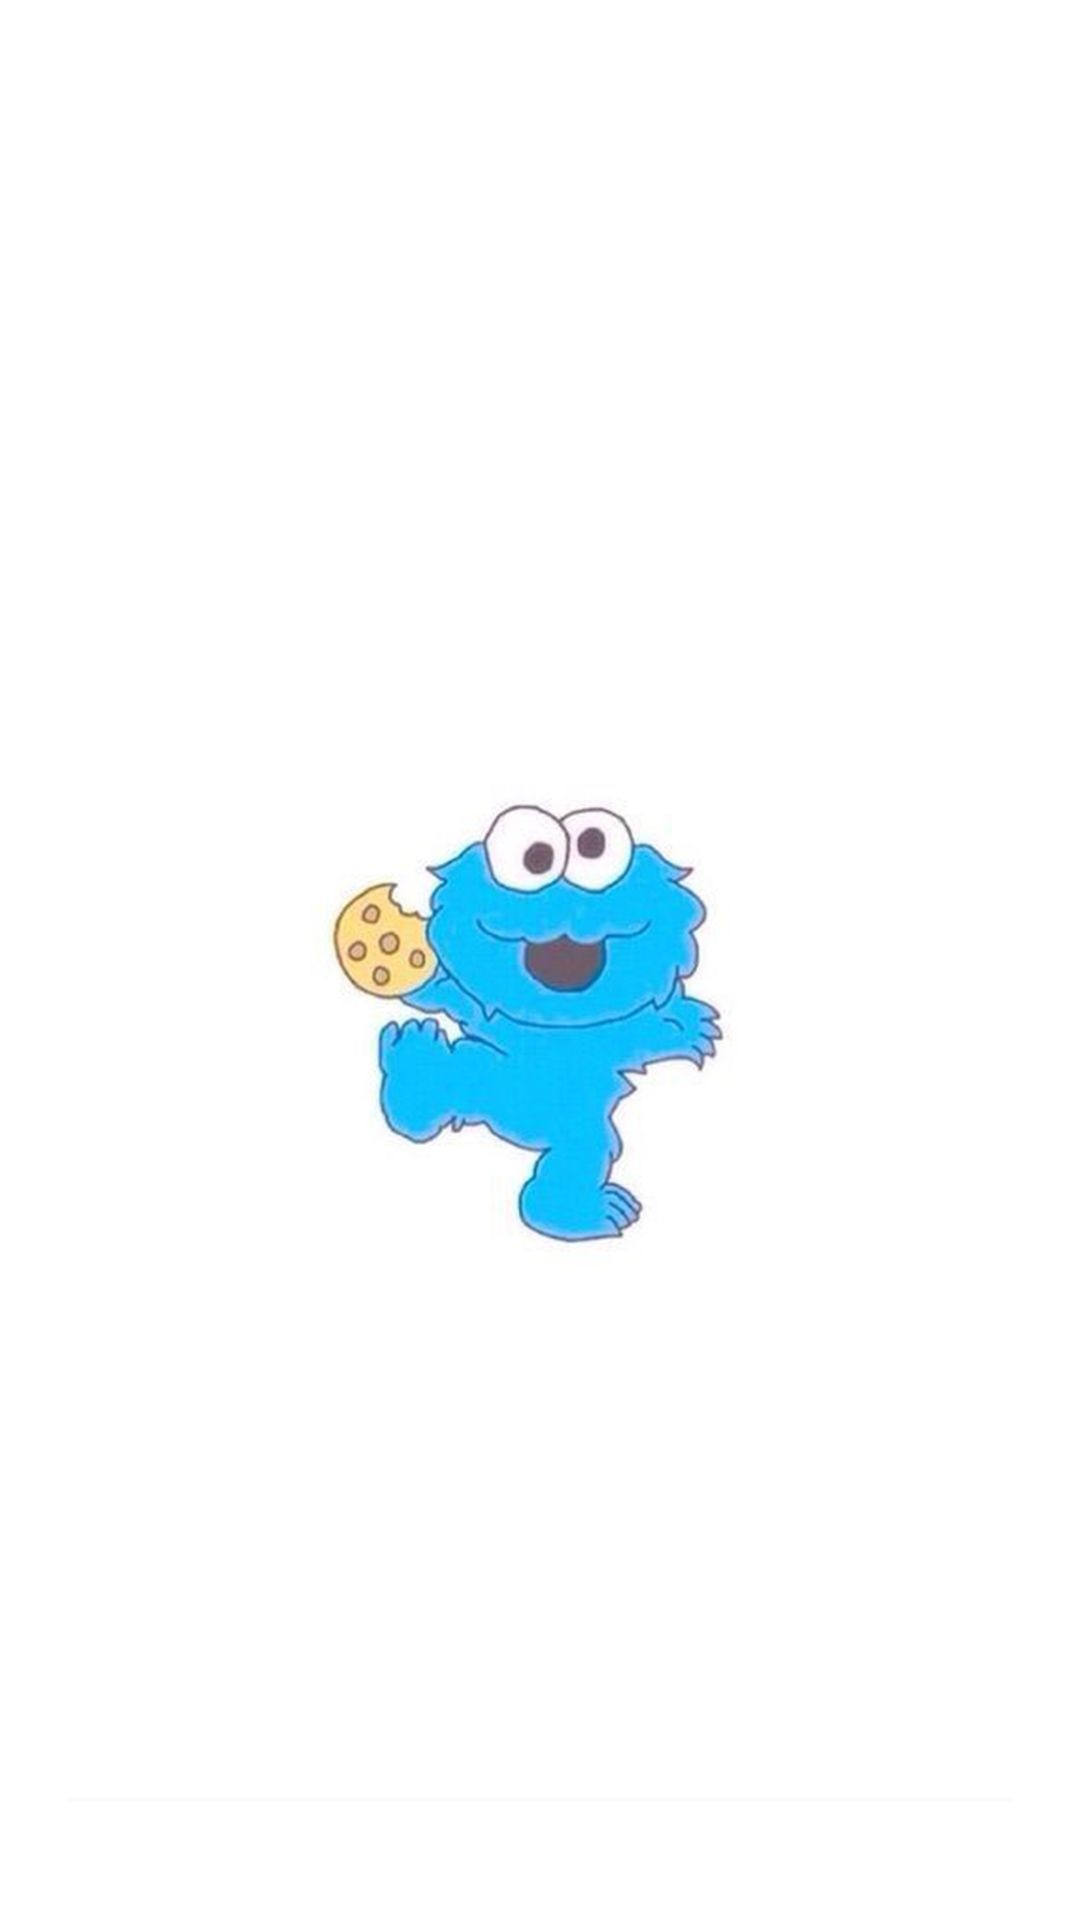 Baby Cookie Monster Iphone 6 Hd Wallpaper Cookie Monster